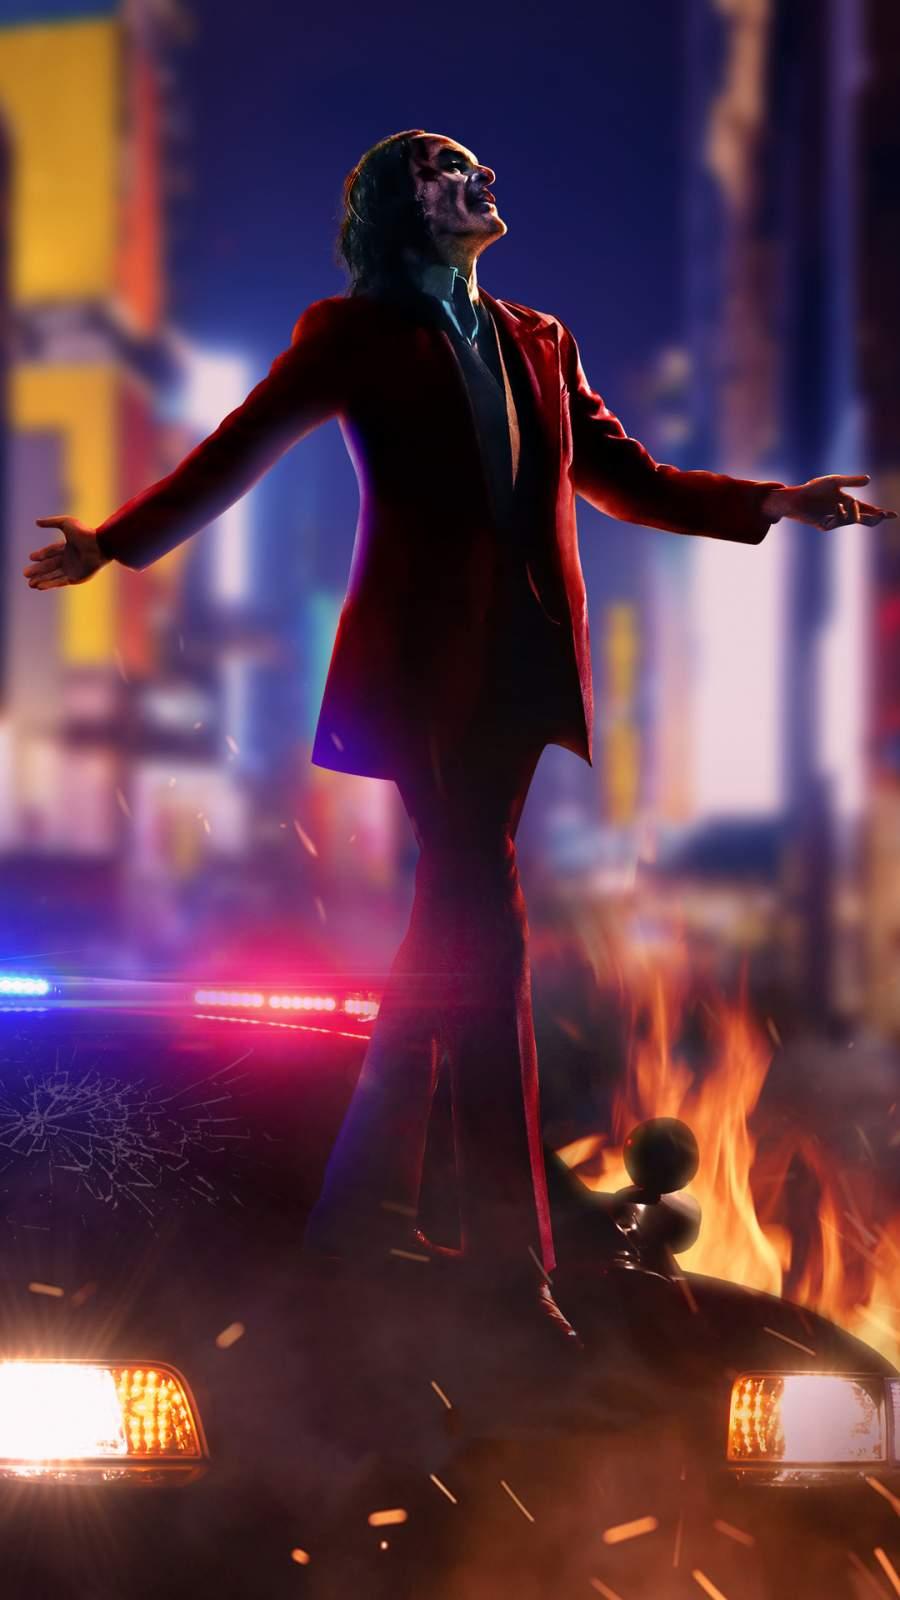 Joker Movie Art iPhone Wallpaper